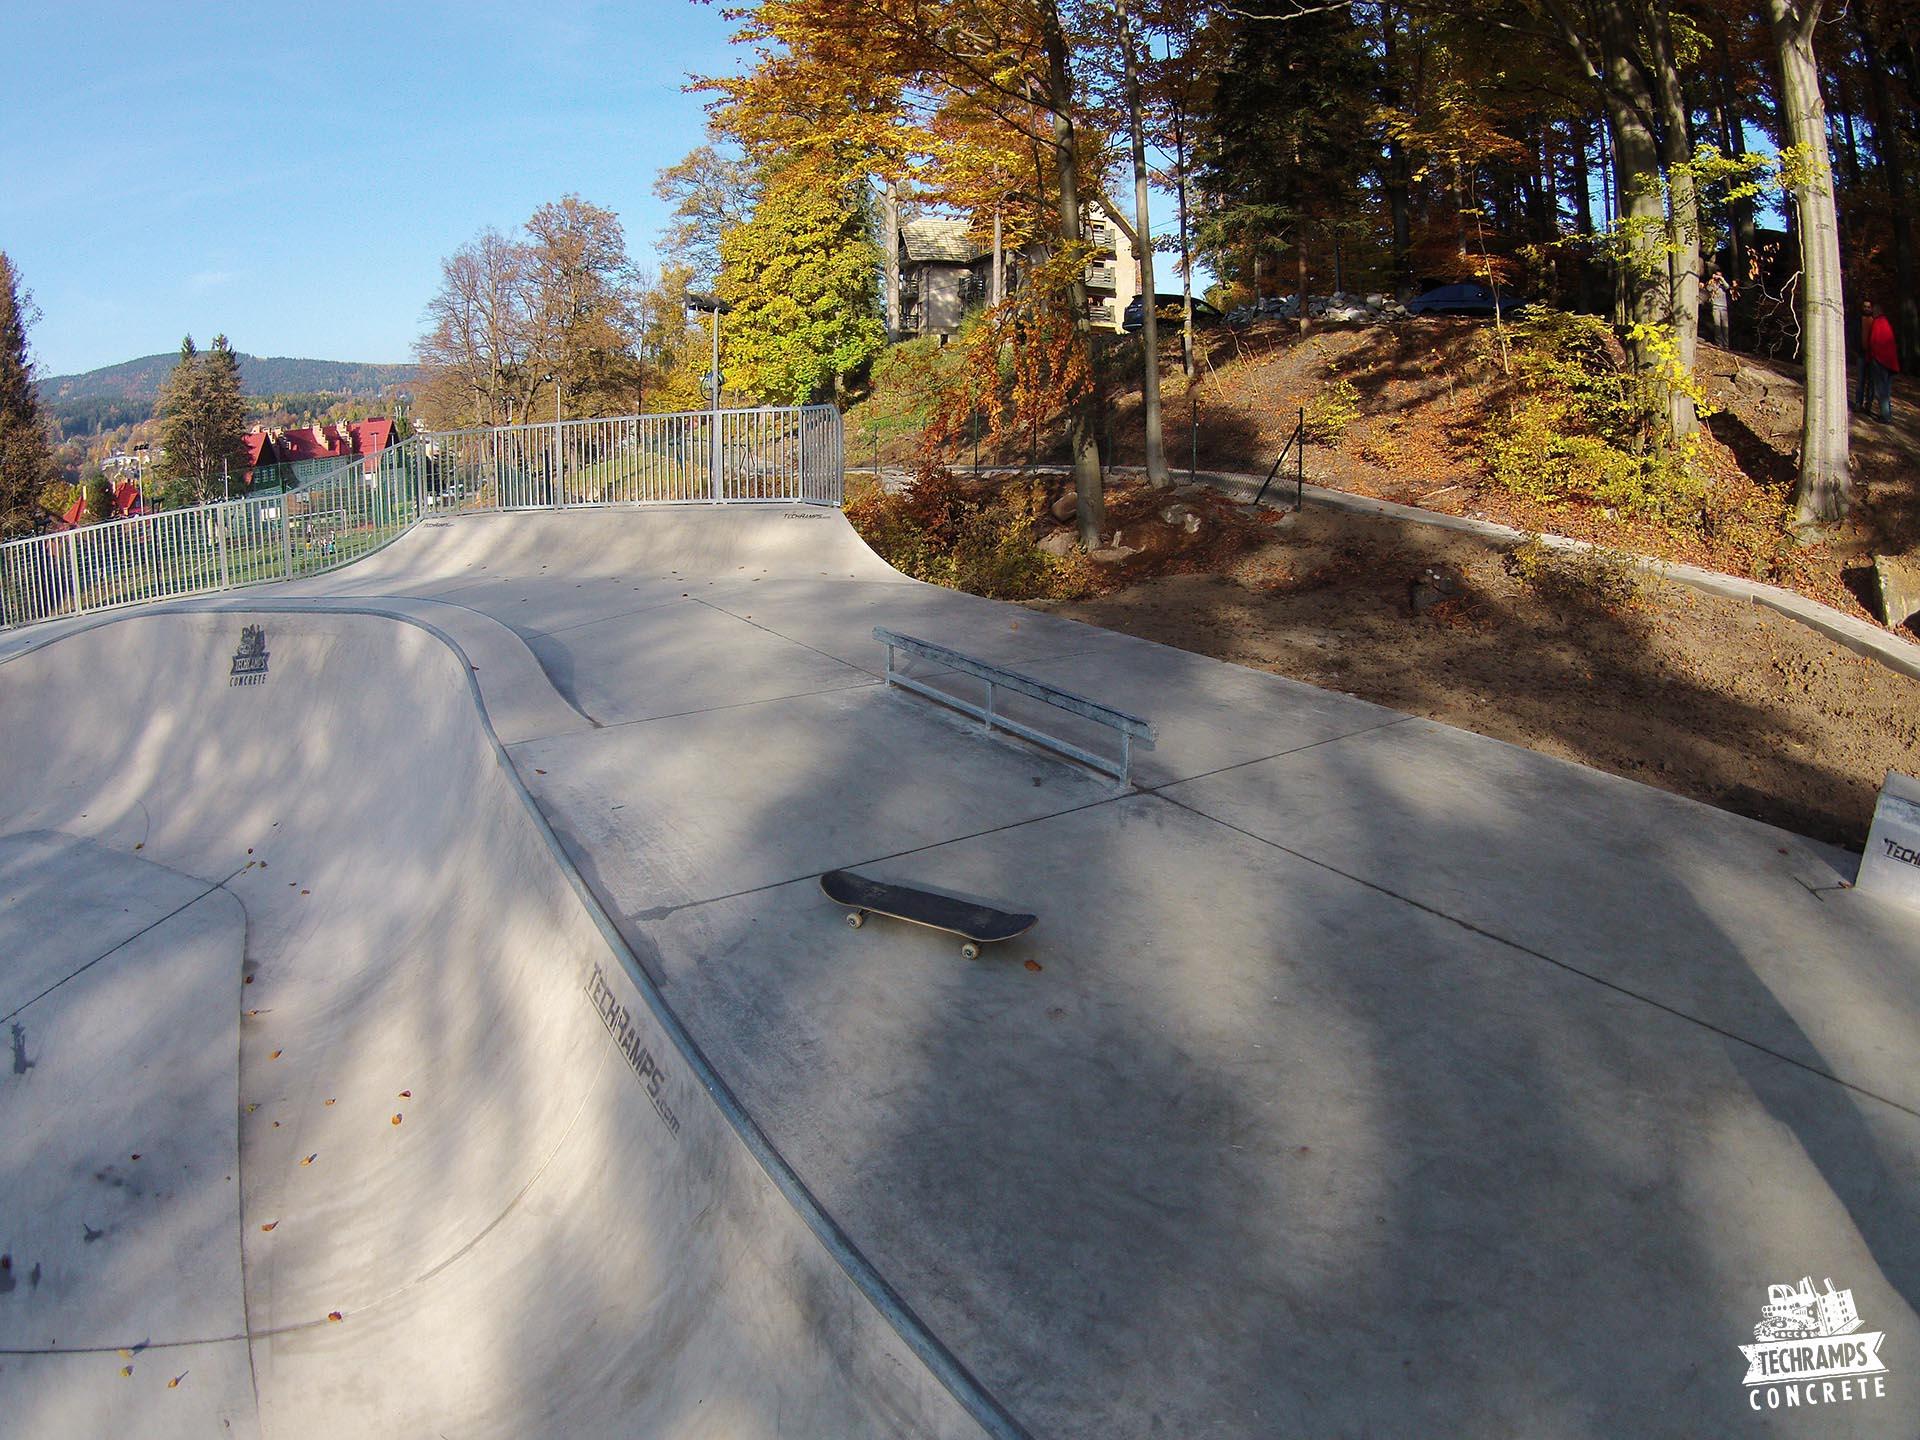 betonowy skatepark Szklarska Poręba